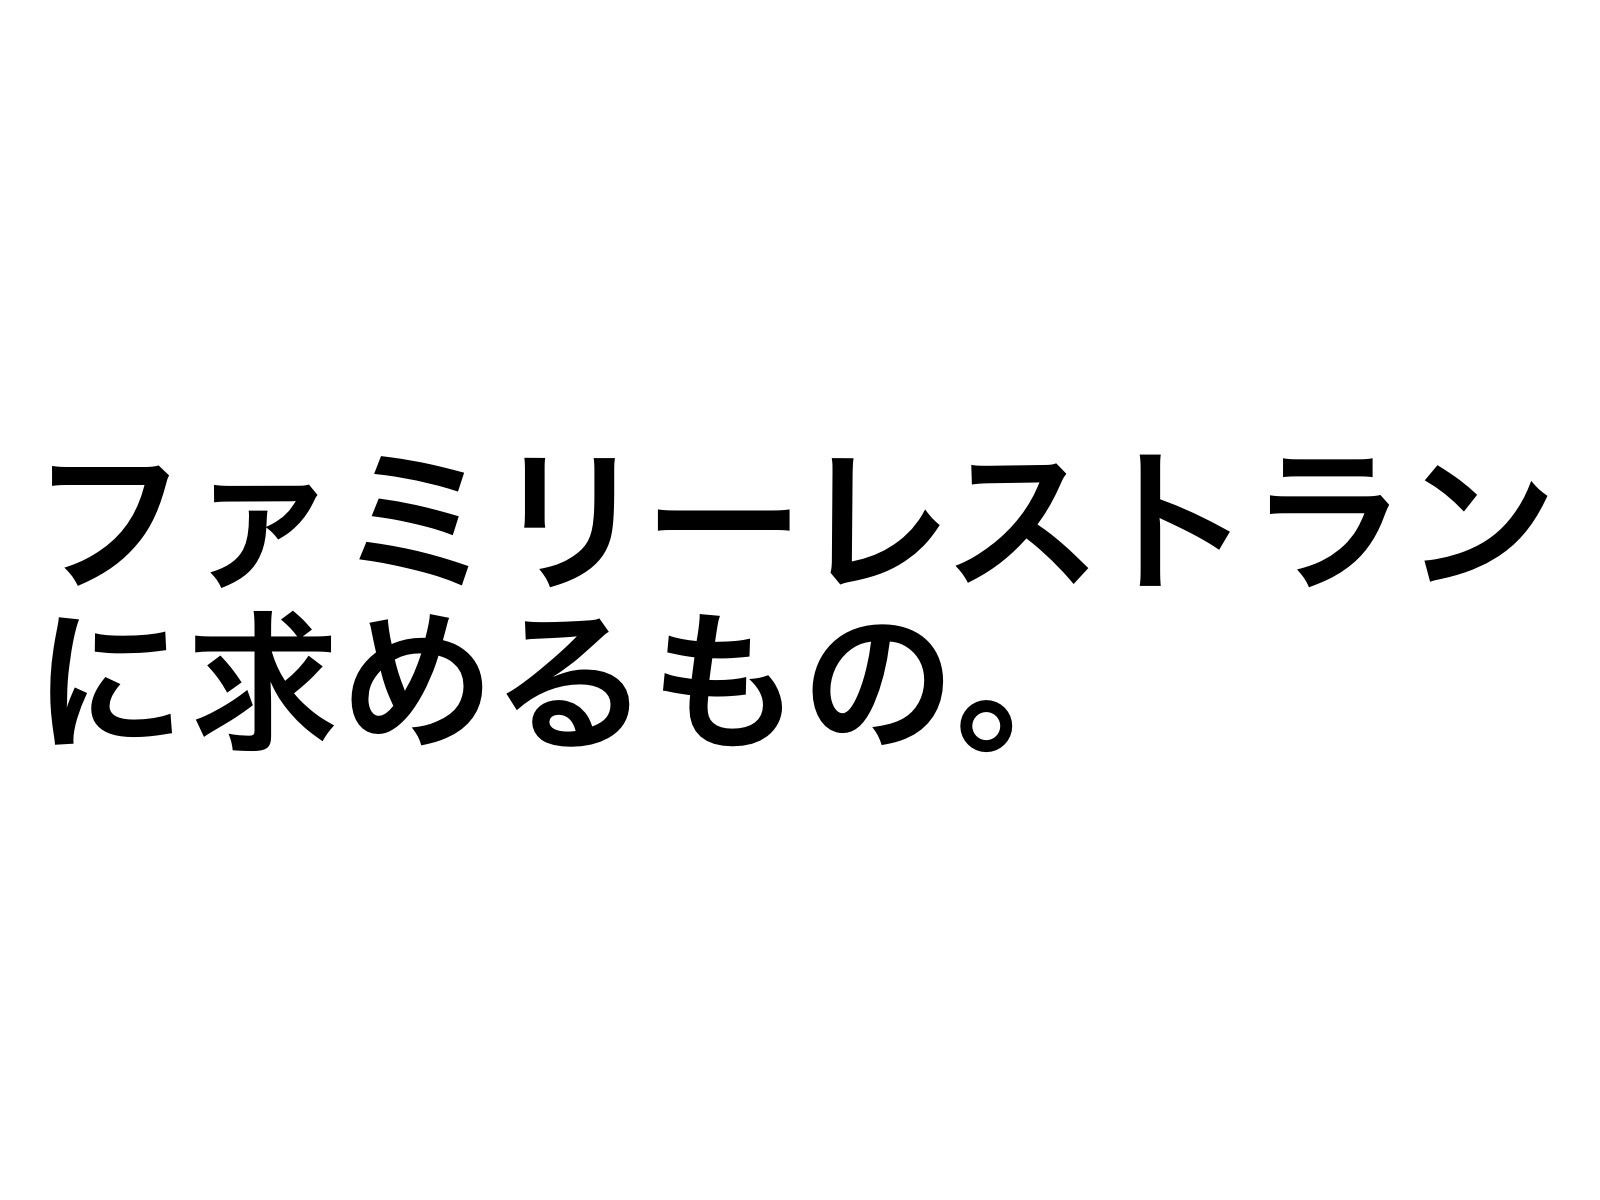 2016 11 09 19 59 35